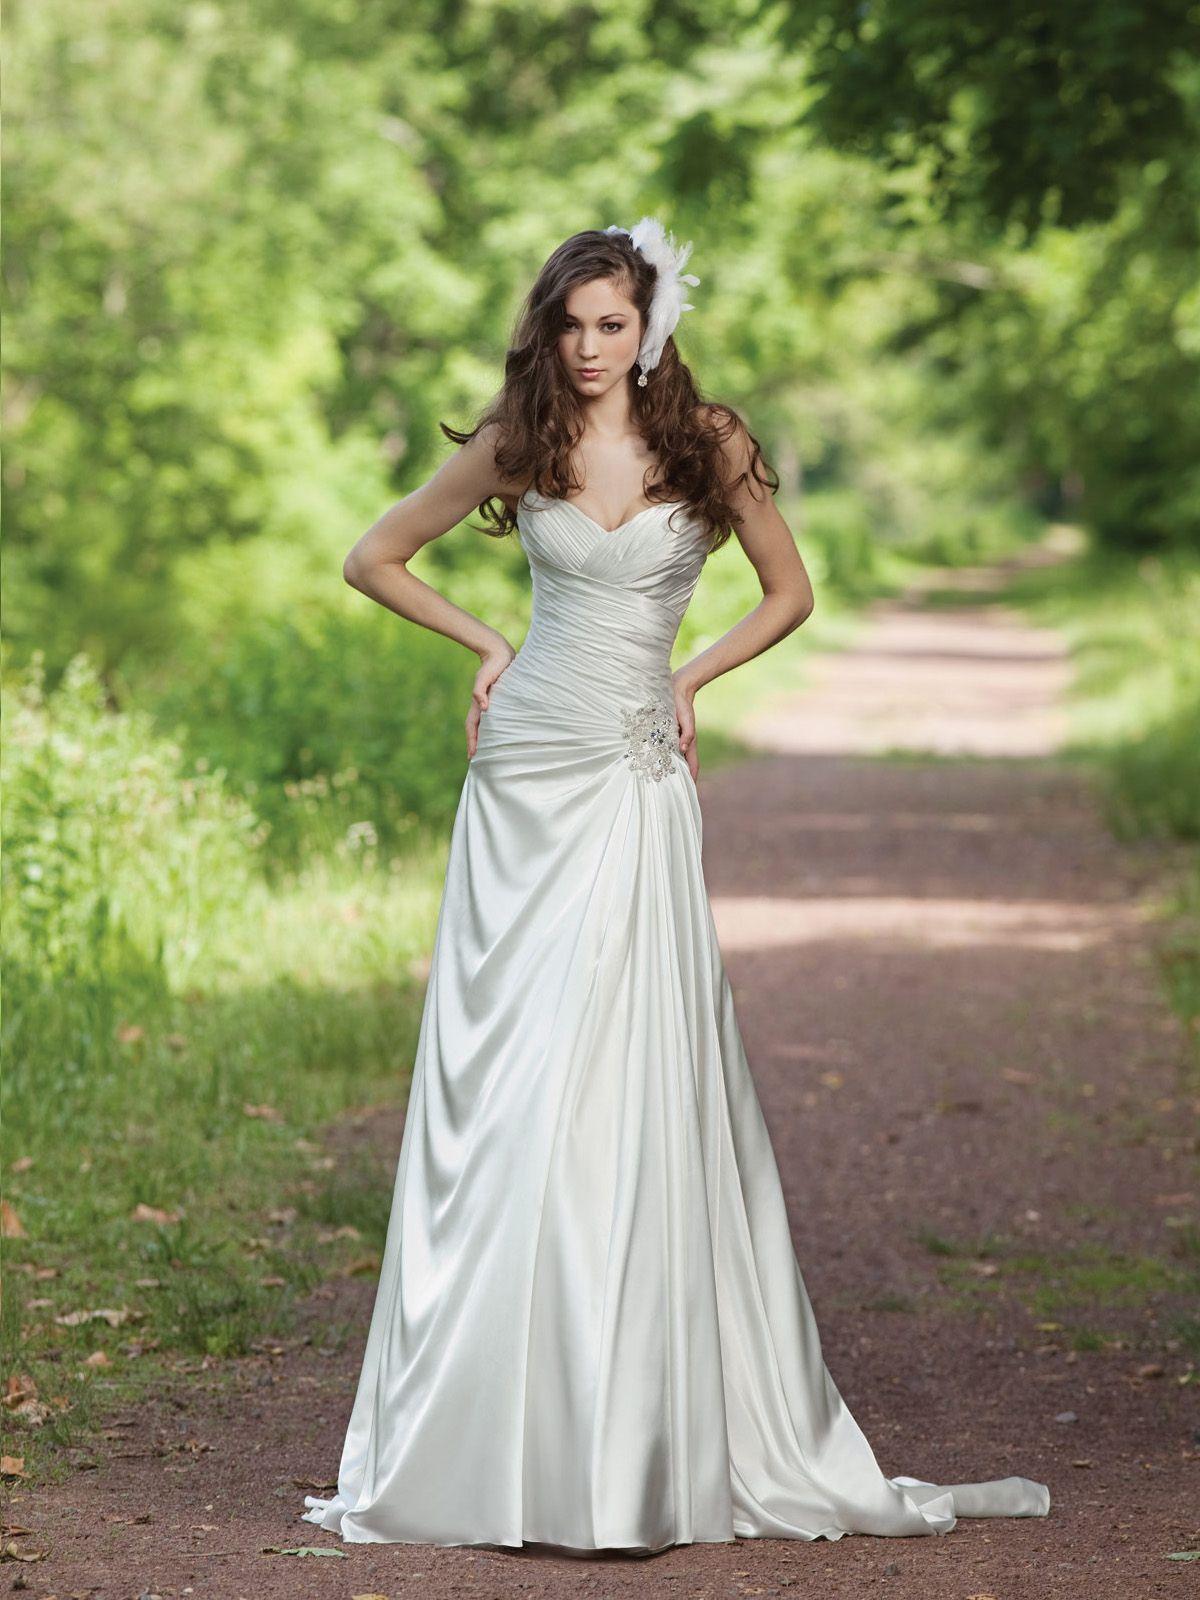 100 dollar wedding dress  Garden Wedding Dresses  Chapel train Bridal gowns and Gowns